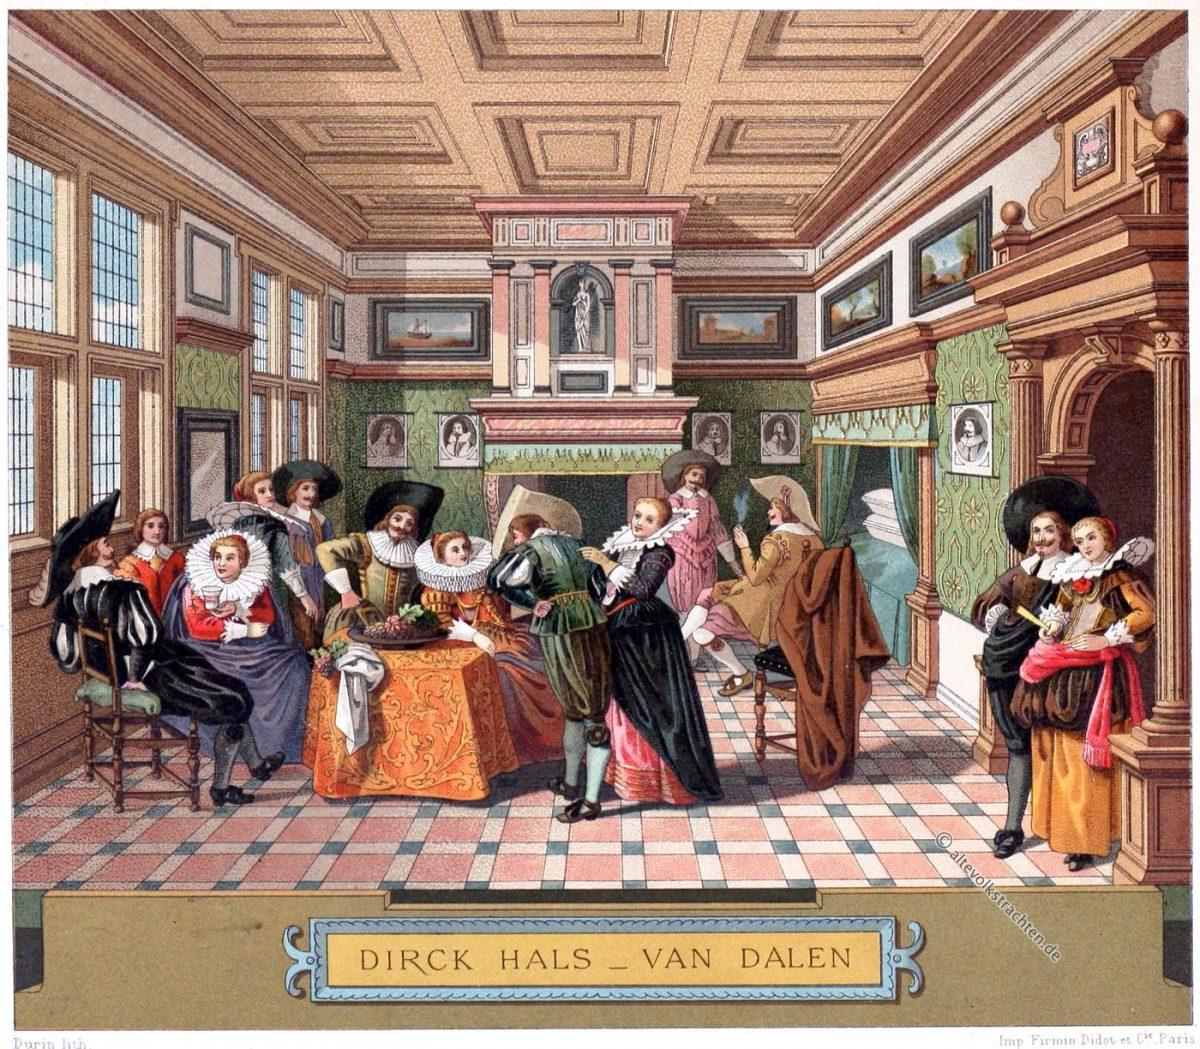 Holland, Niederlande, Barock, Kleidung, Mode, Kostüme, Halskrause, Interieur